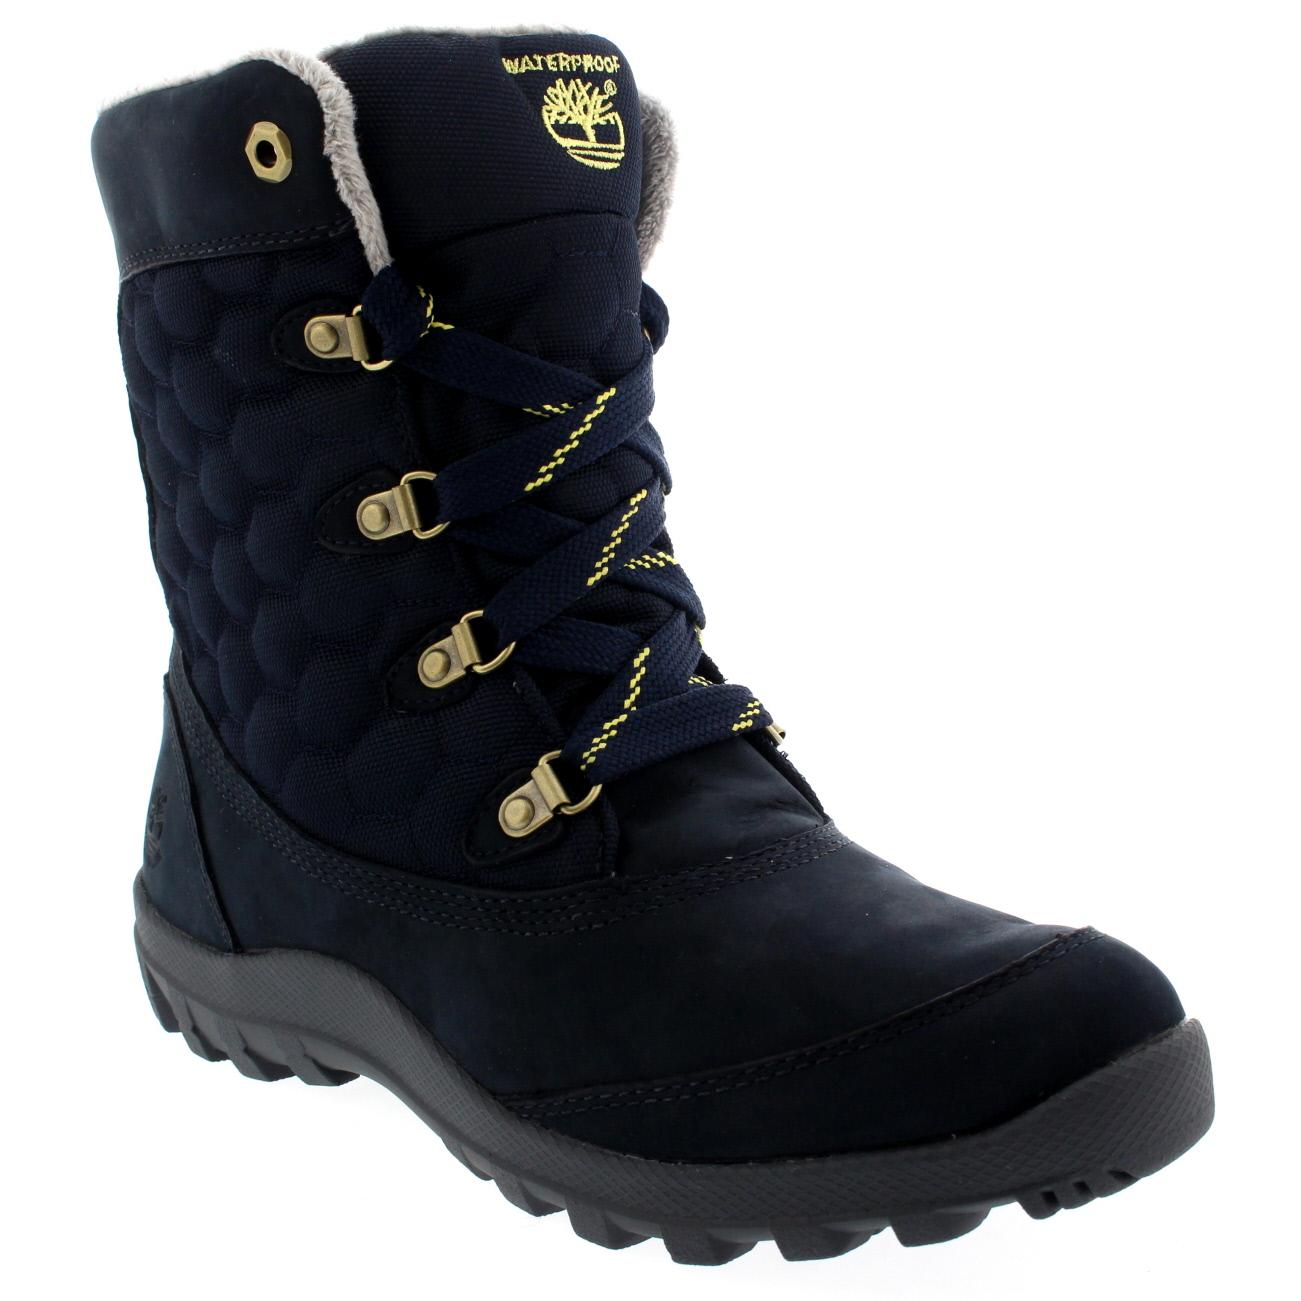 Ladies Timberland Earthkeeper Mount Hope Shoes Snow Rain